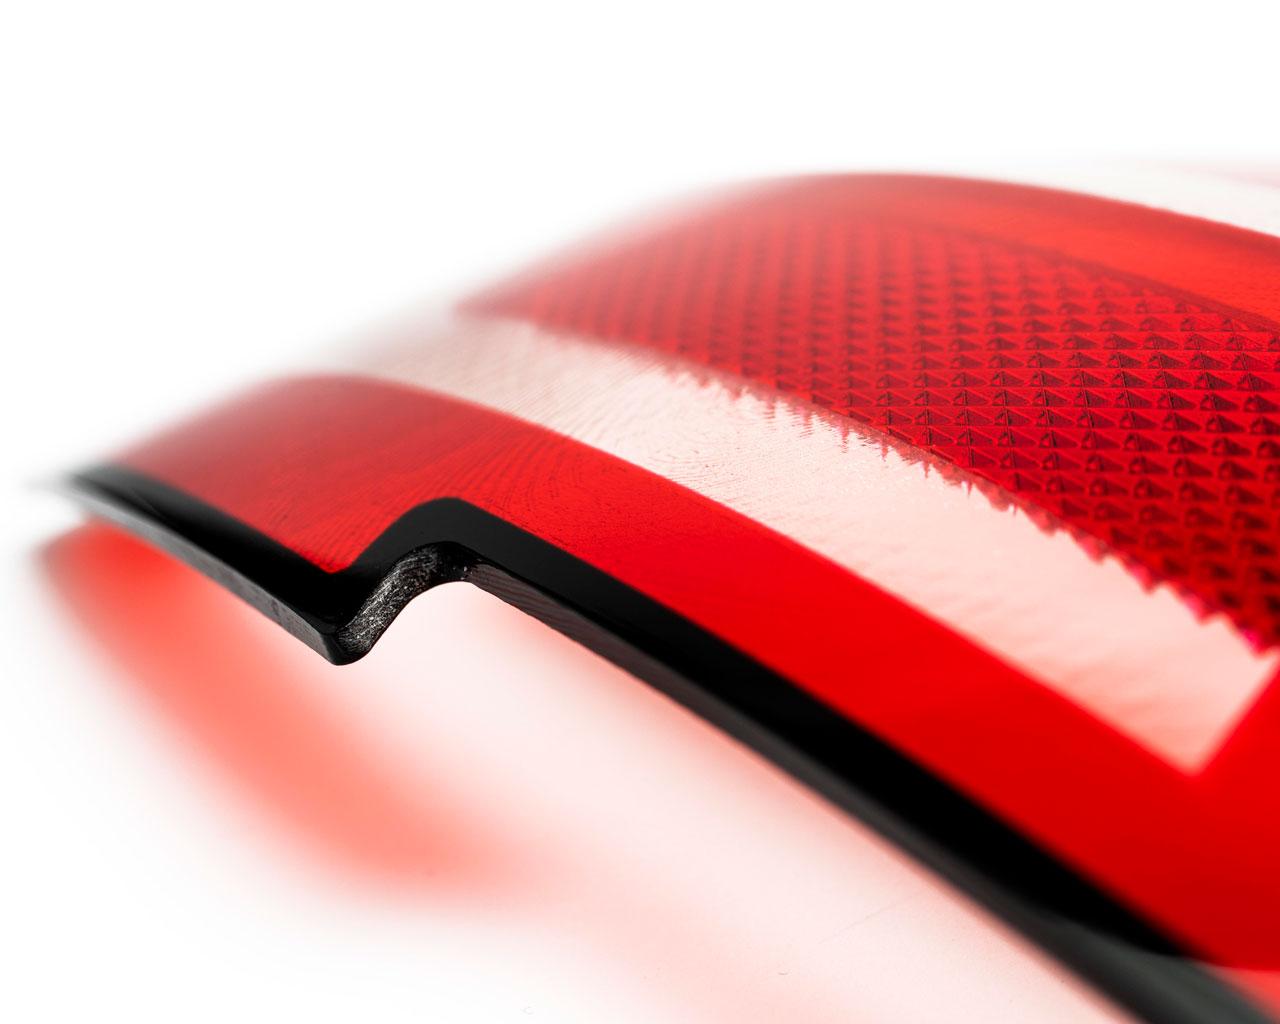 Fahrzeugrücklicht – Stratasys J750 Vivid White